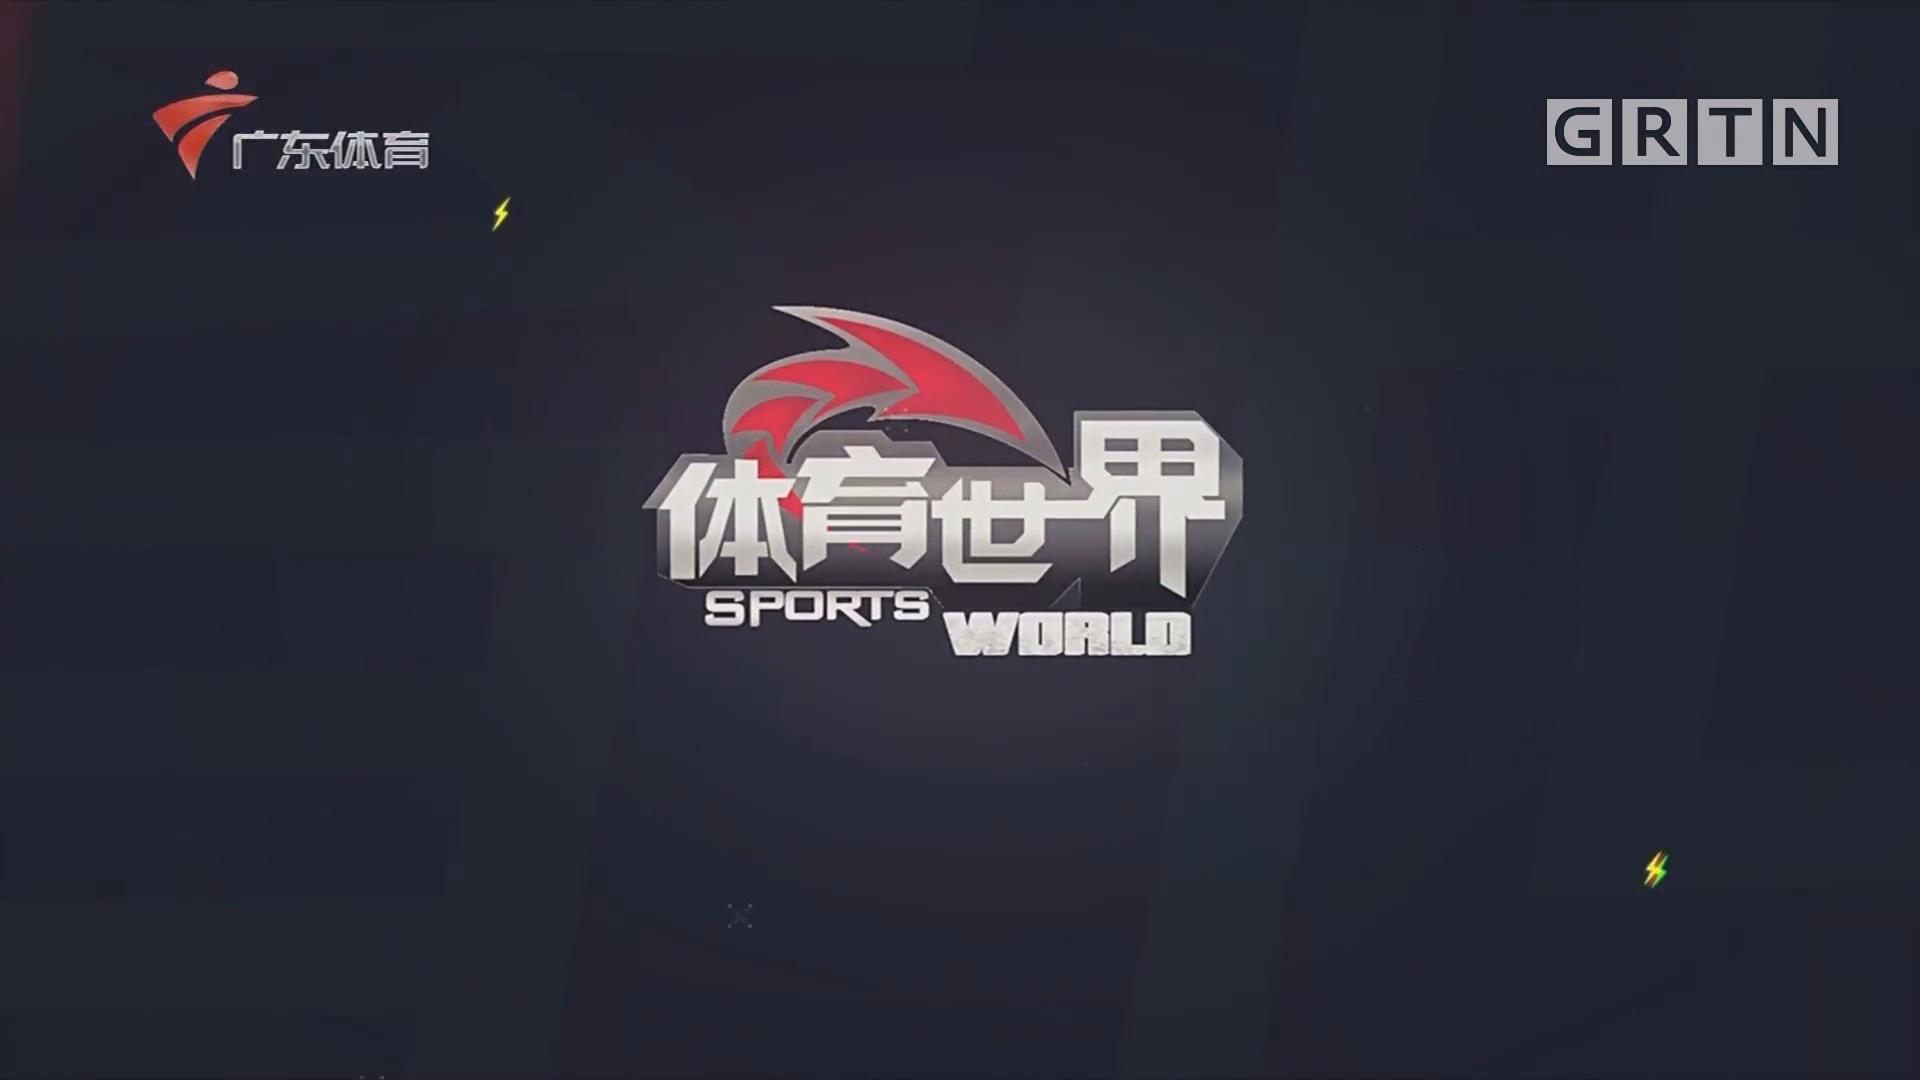 [HD][2020-06-02]体育世界:广东独臂篮球少年展超高球技 朱芳雨:请你来看CBA